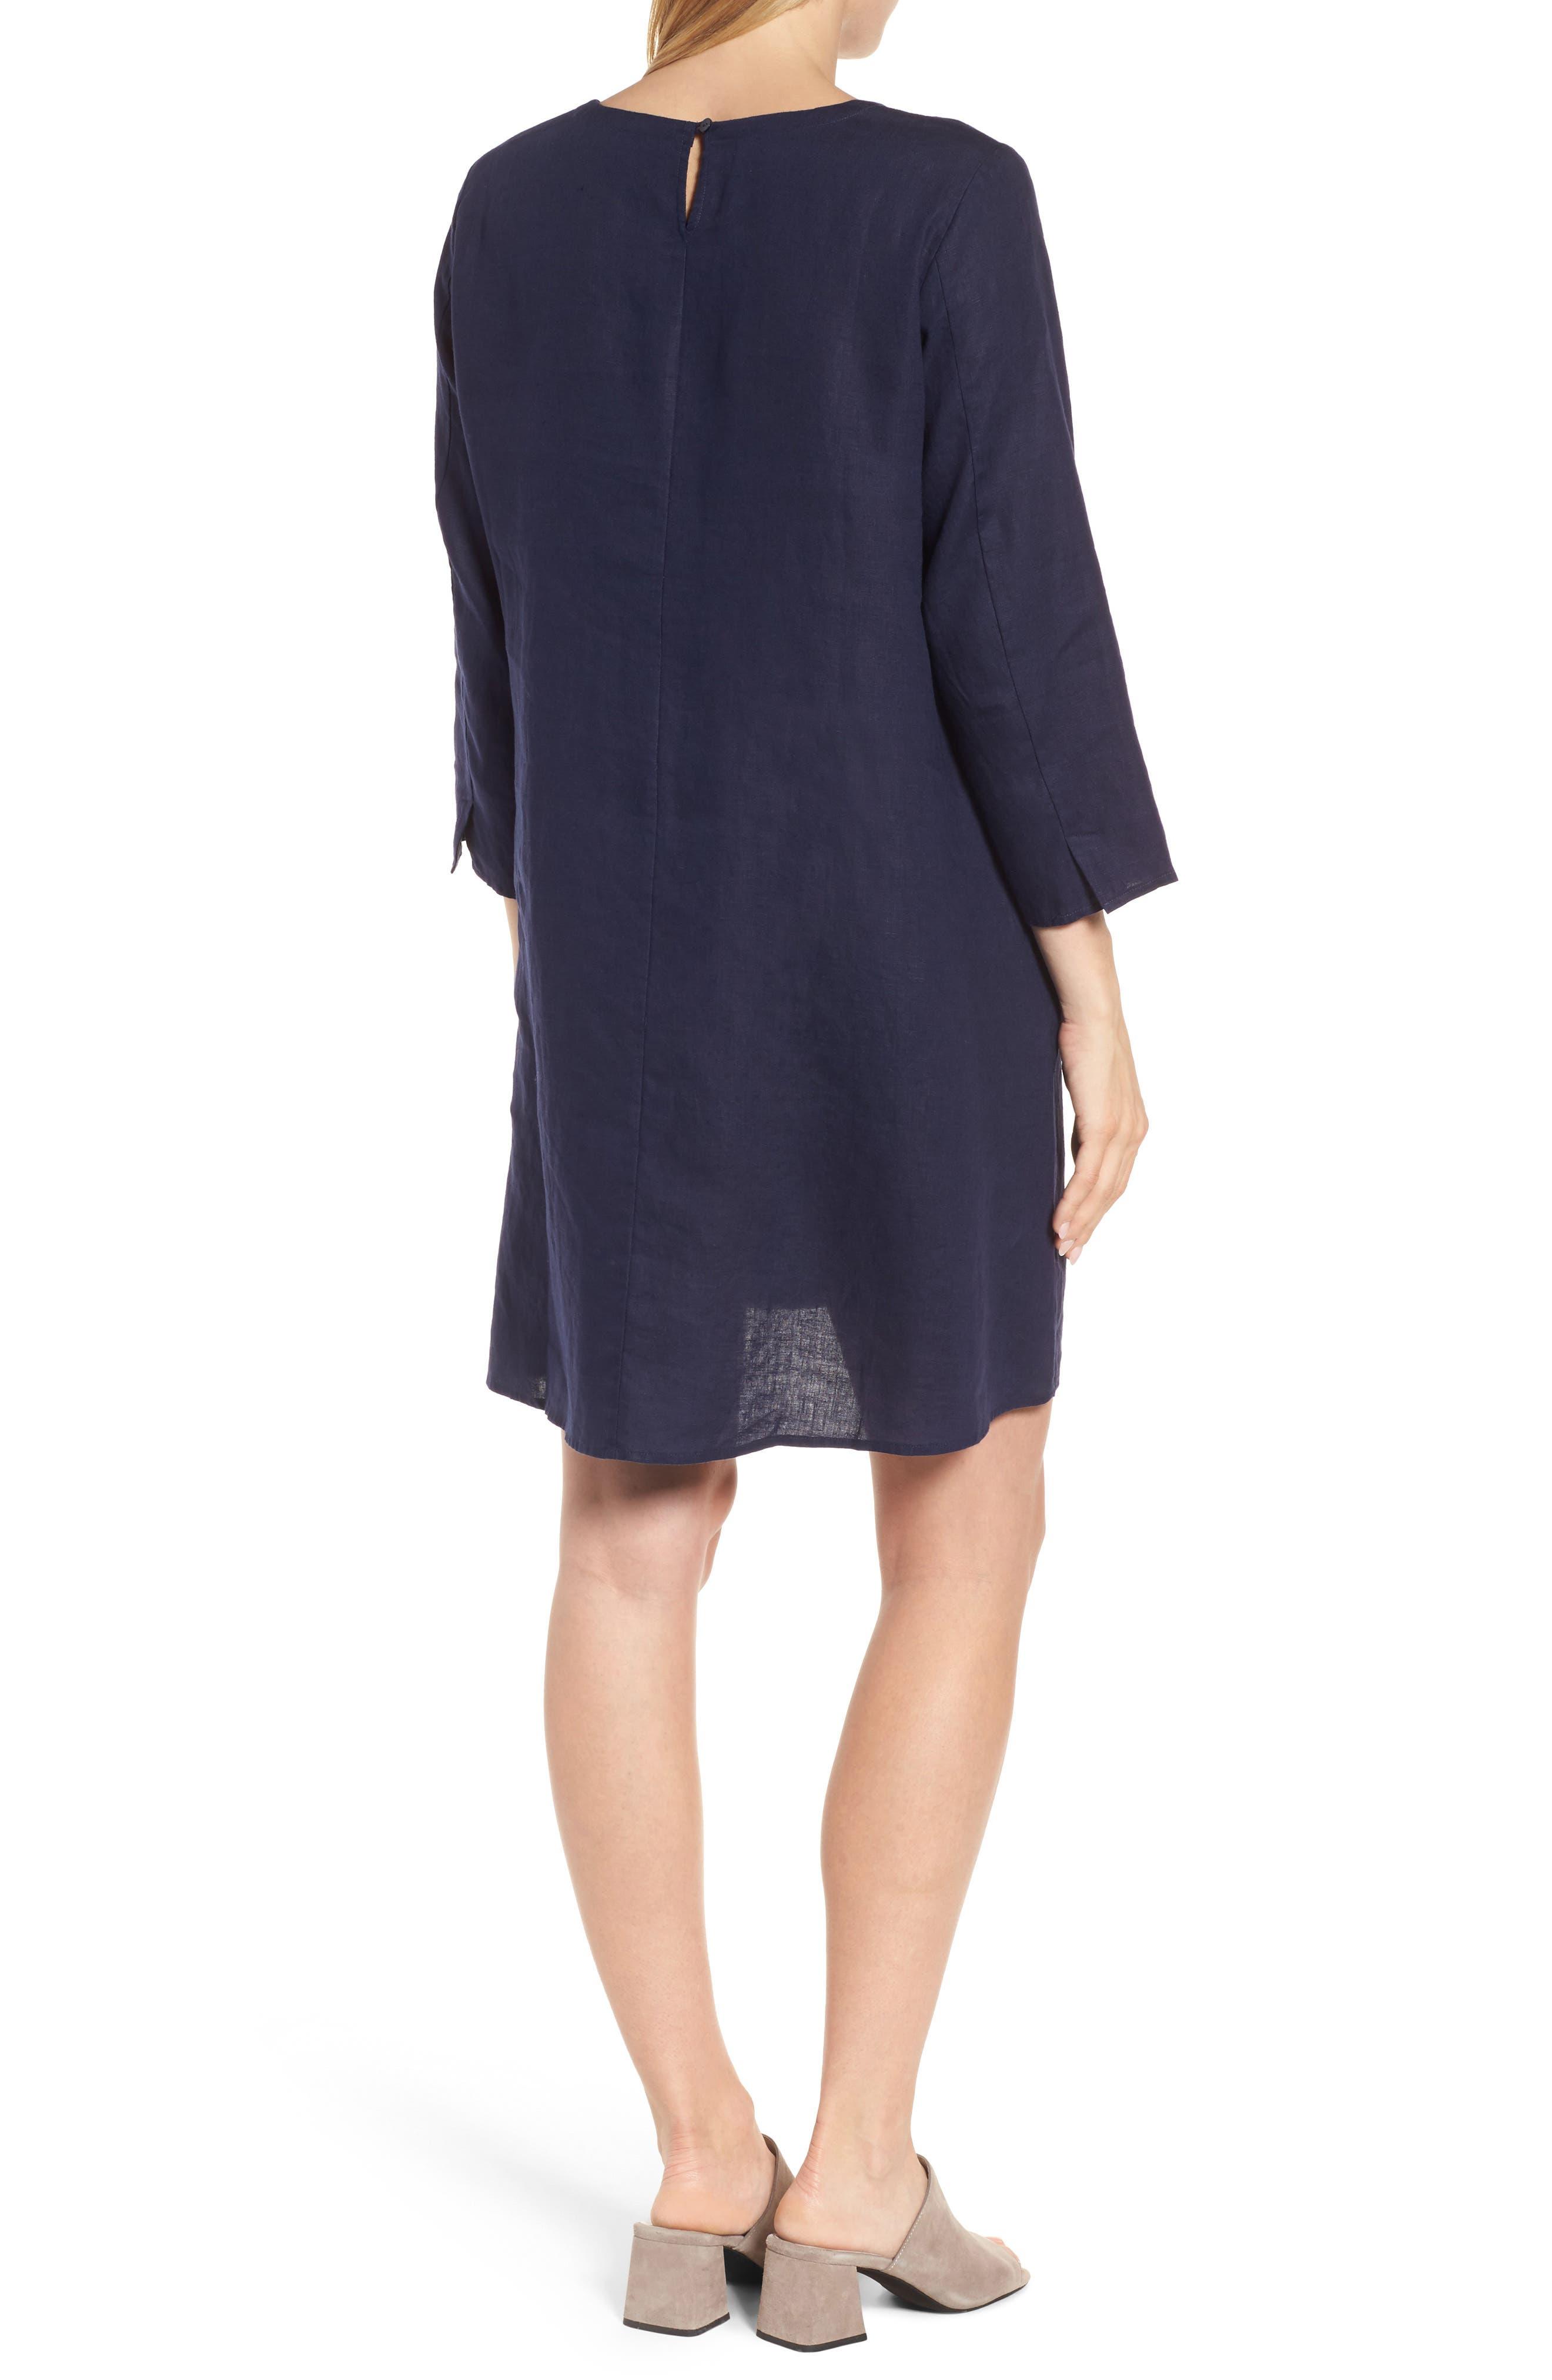 Organic Linen Round Neck Shift Dress,                             Alternate thumbnail 2, color,                             419